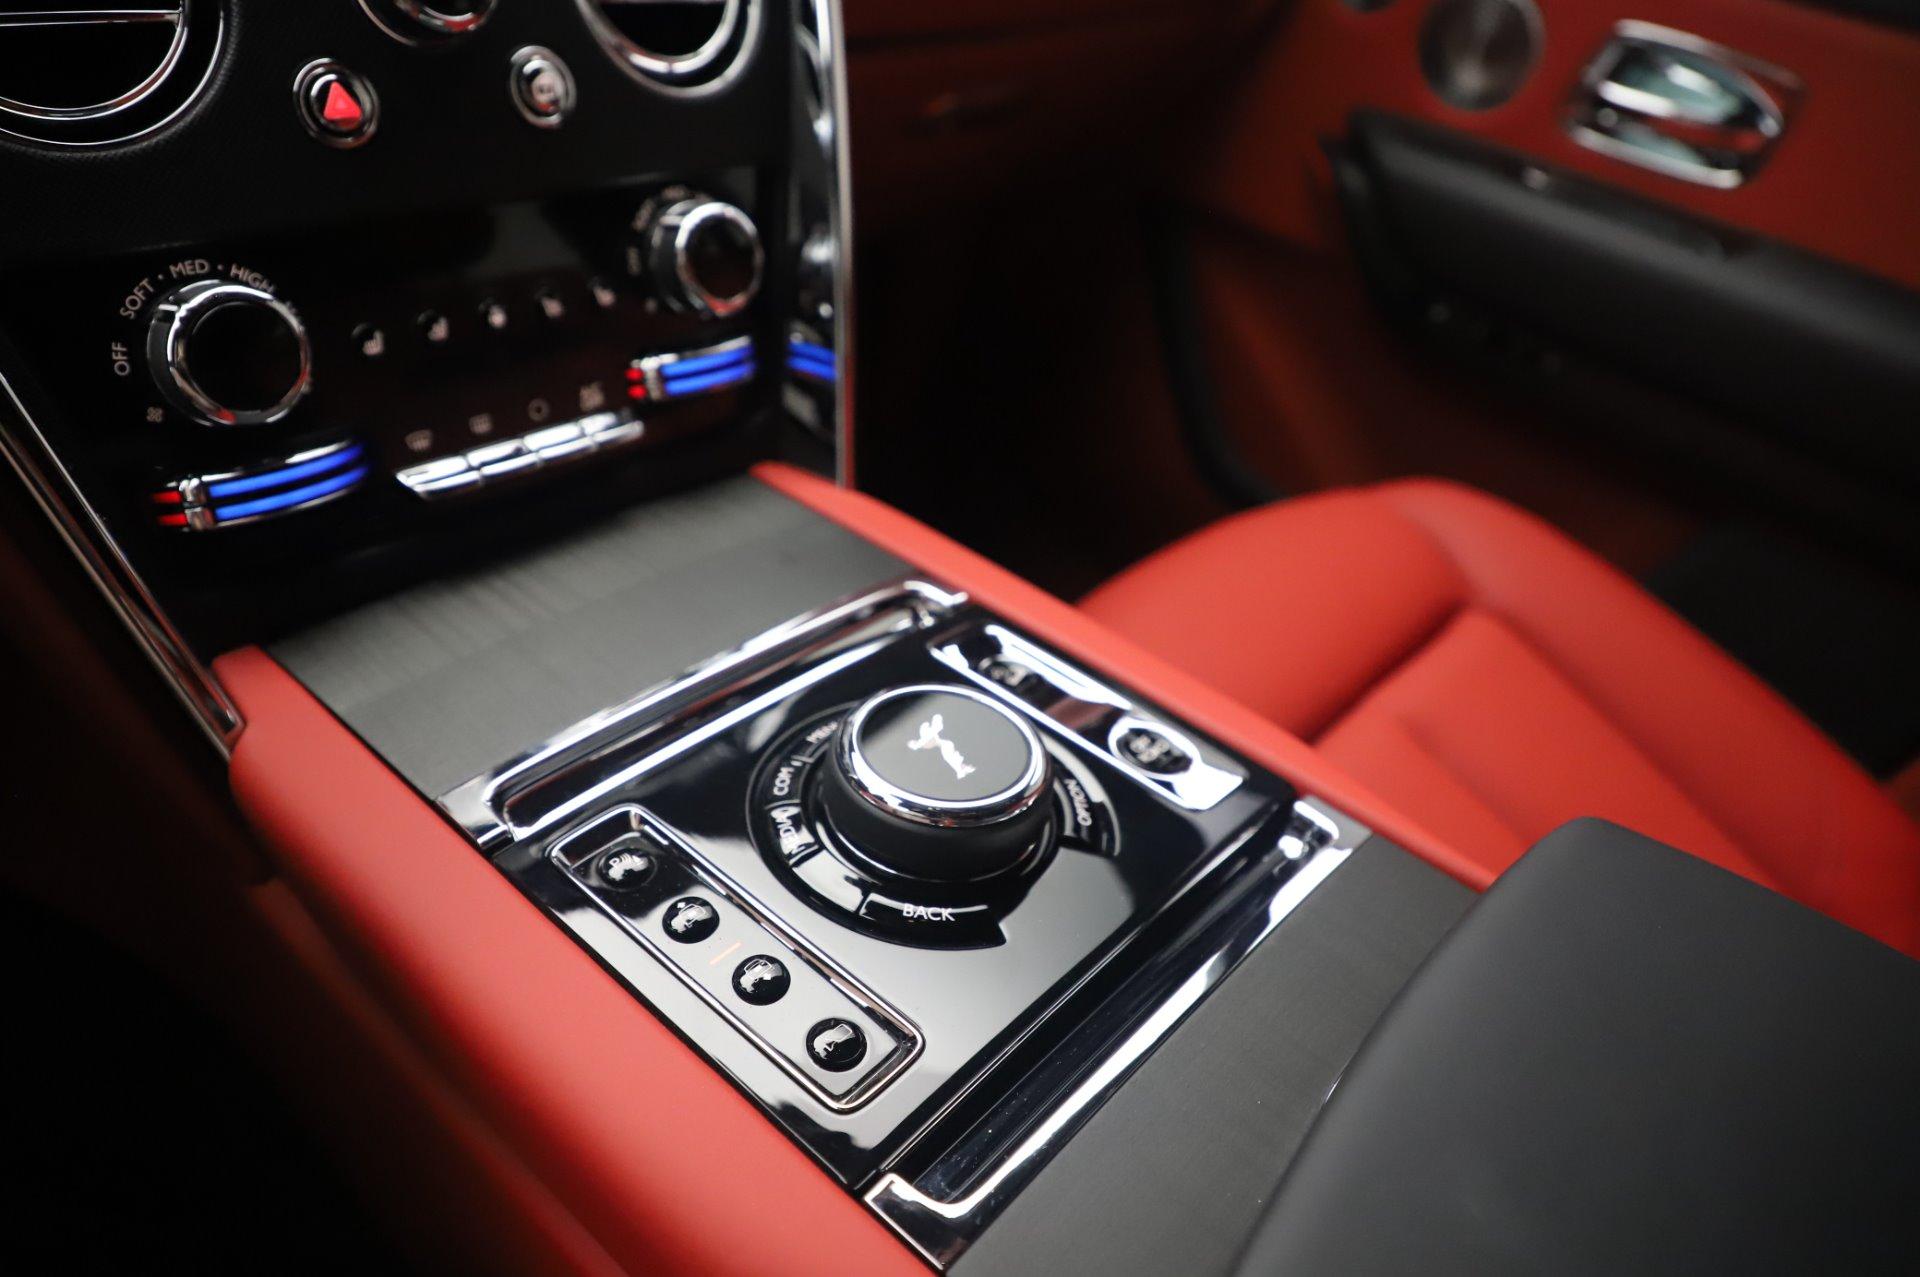 New 2020 Rolls Royce Cullinan